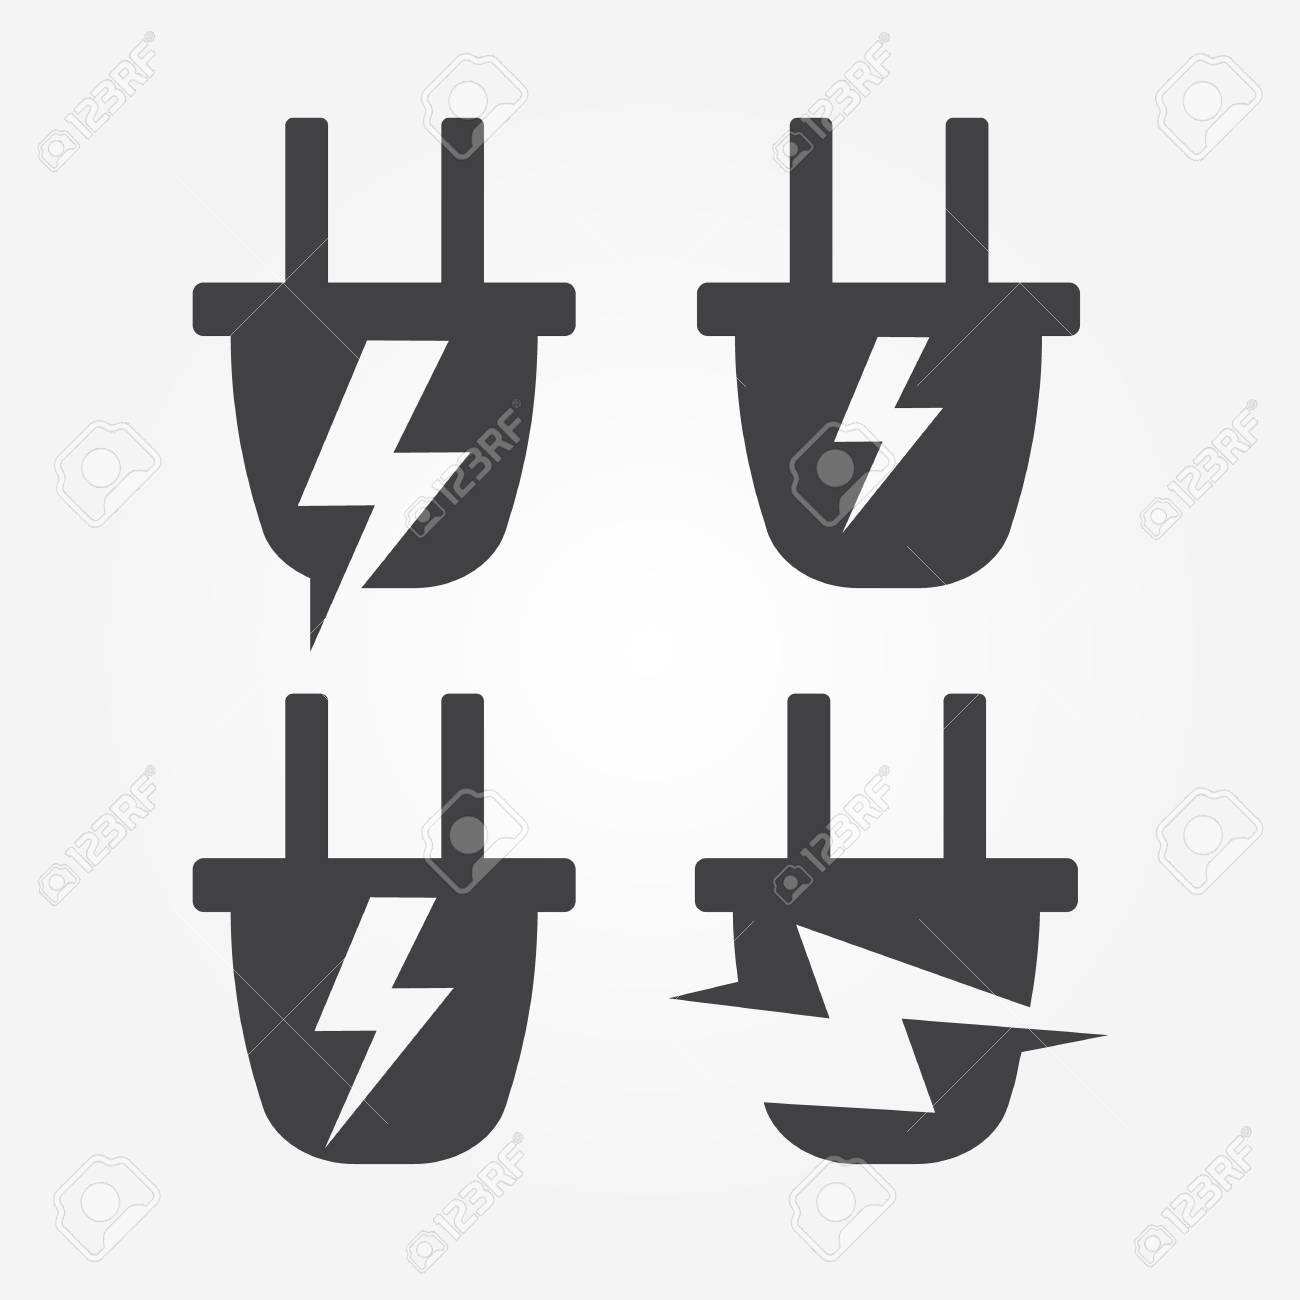 hight resolution of house wiring logo wiring diagram hethouse wiring logo wiring diagram fascinating house wiring logo house wiring